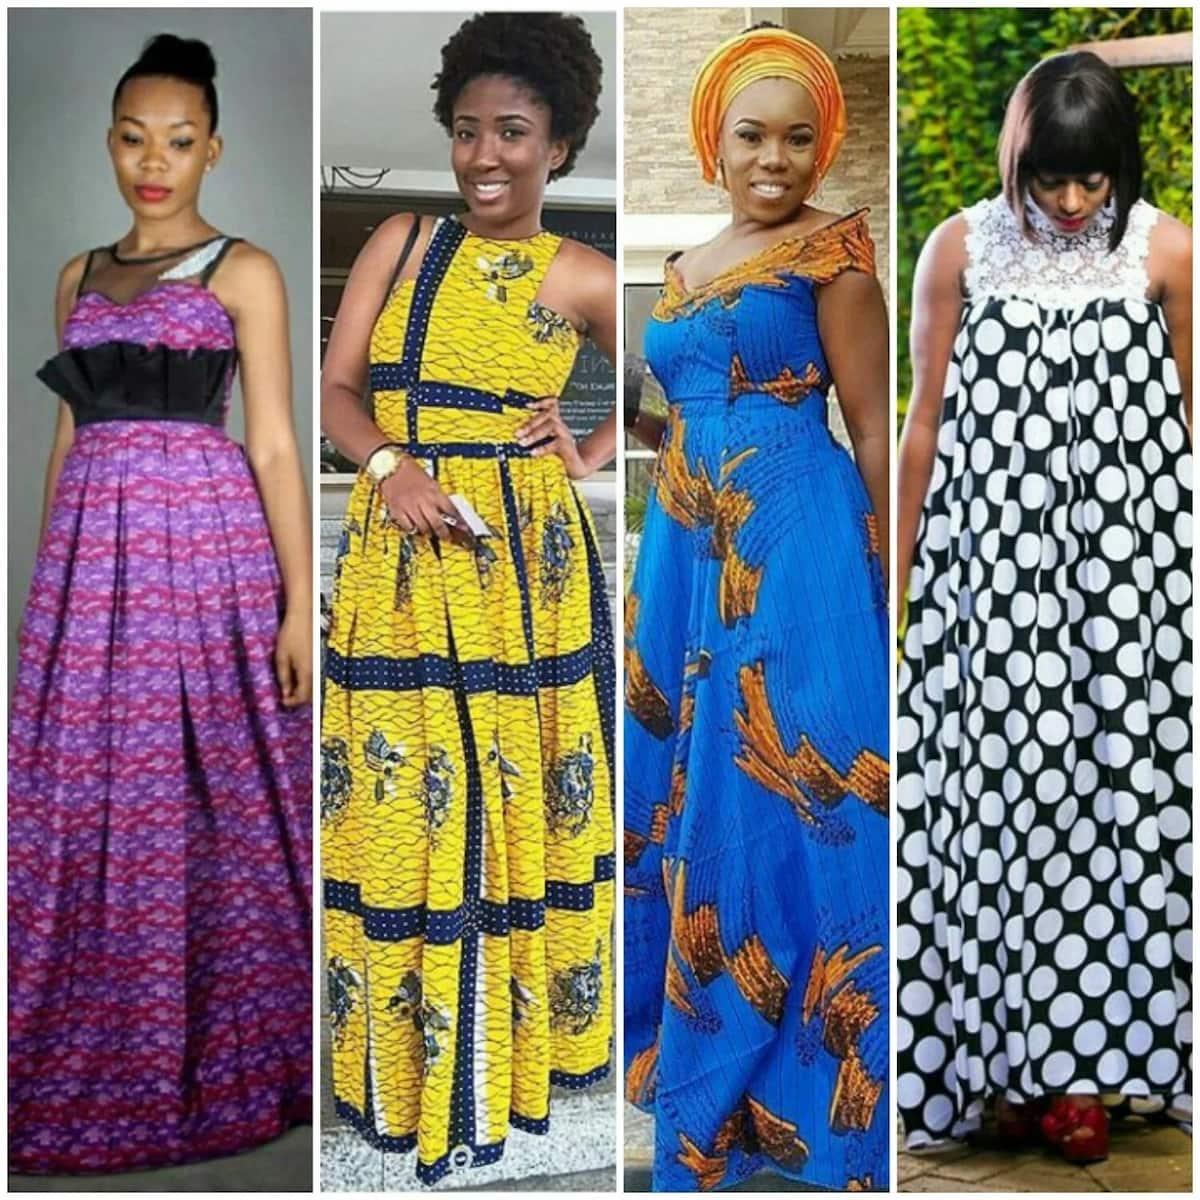 Latest Kitenge Dress Designs 2018 (photos) Tuko.co.ke